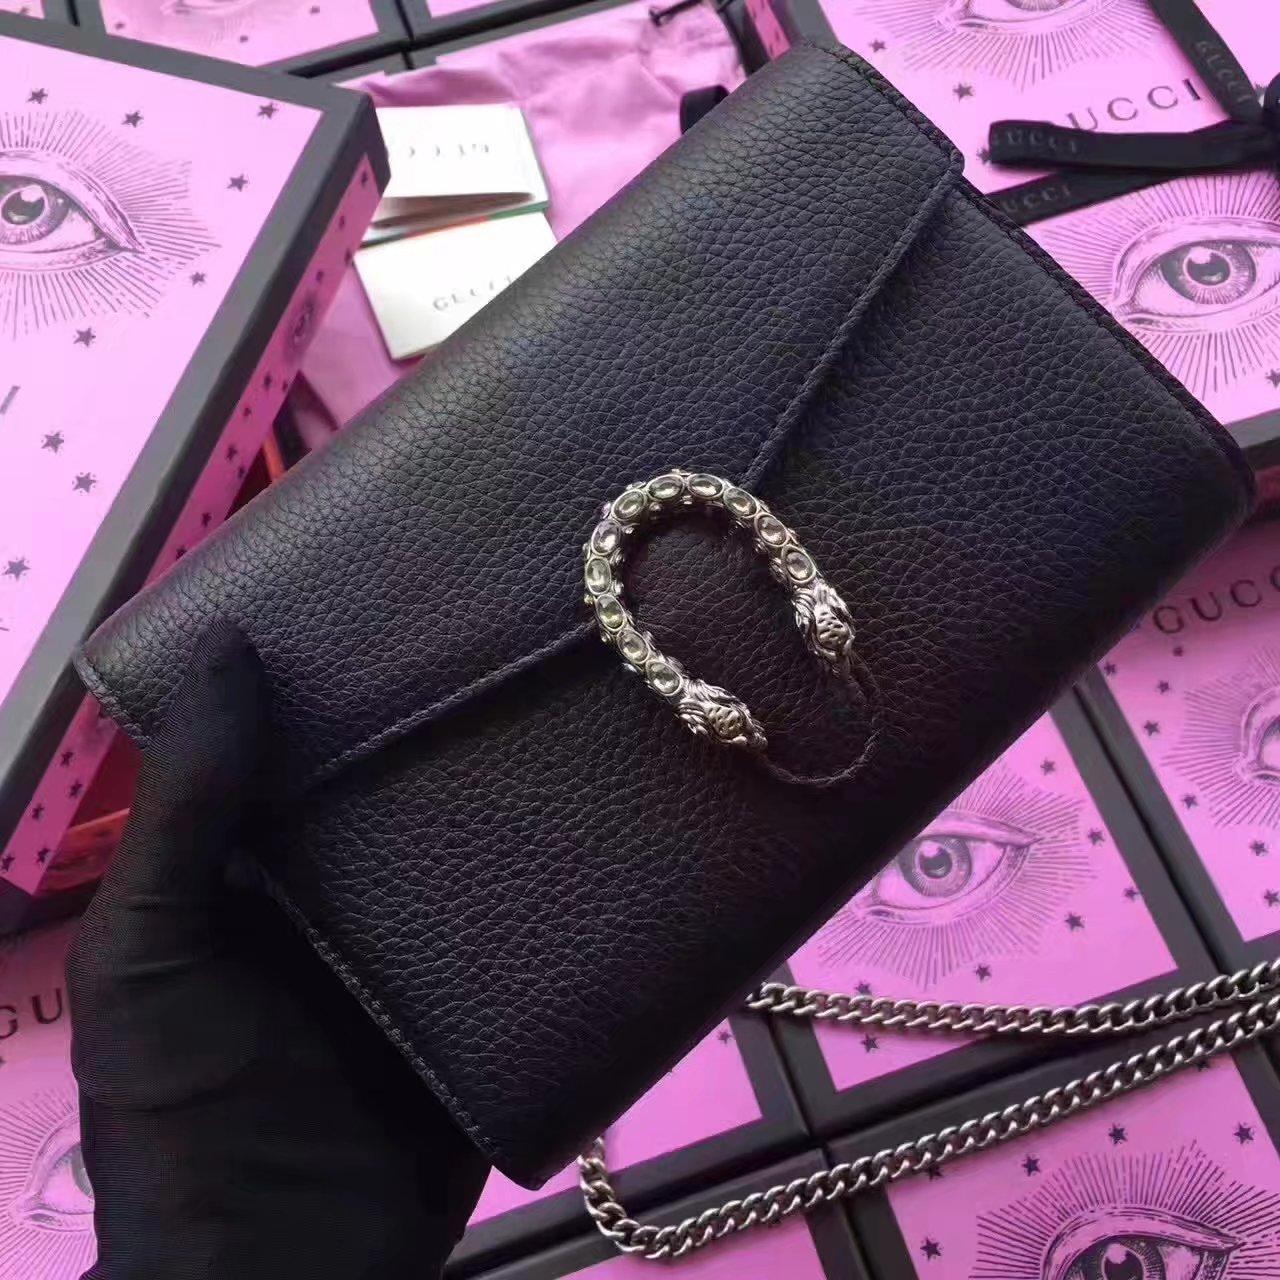 Gucci 401231 Dionysus Leather Mini Bag Black 5367f29fb6